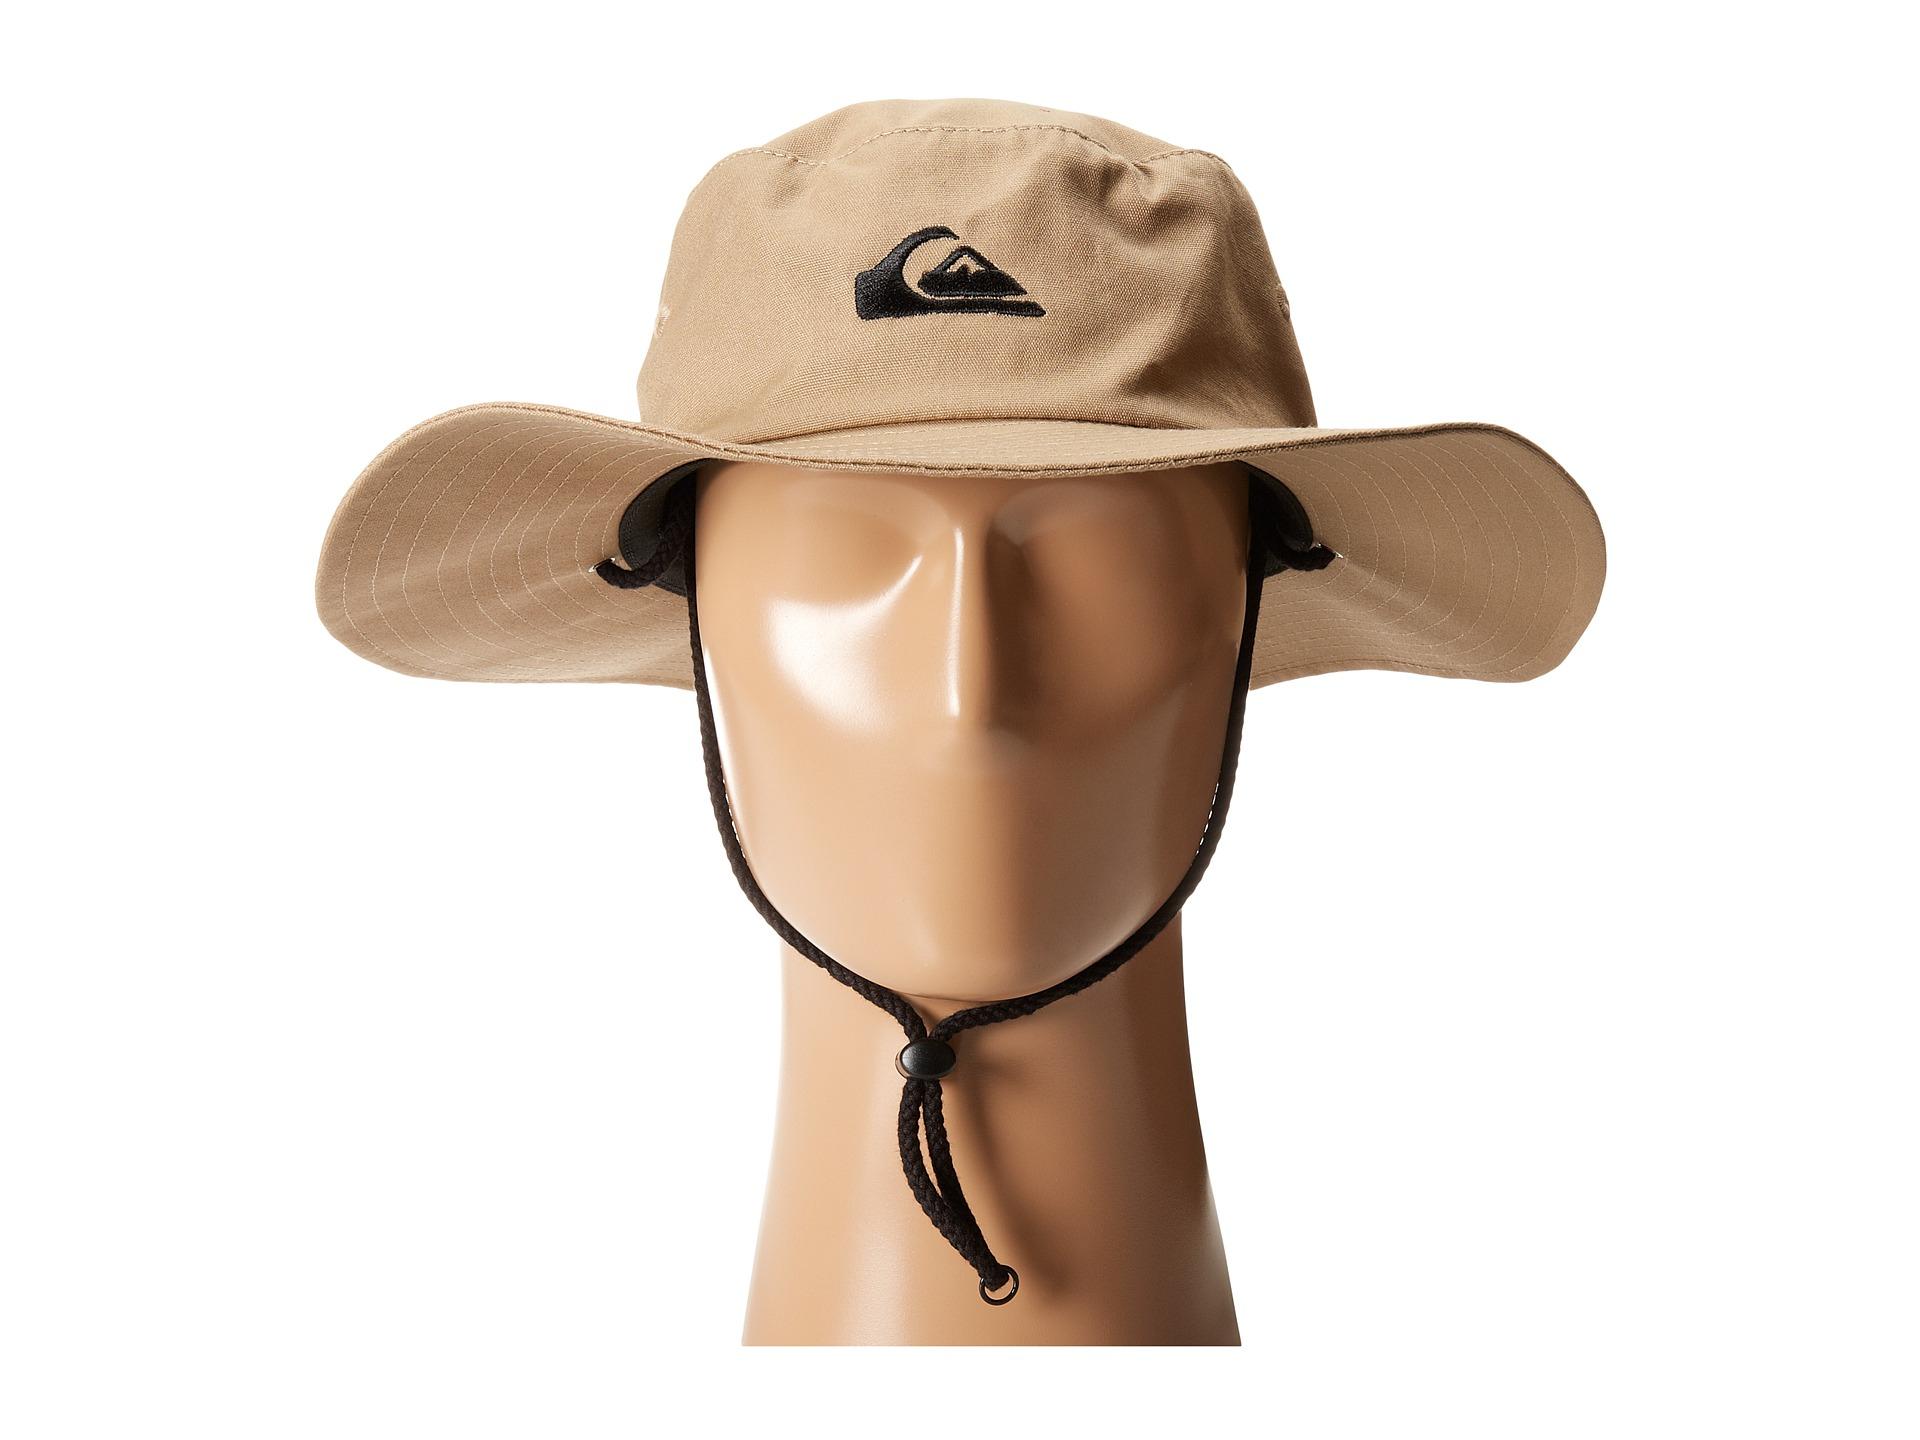 cc8c1d1bf1874e Quiksilver Original Bushmaster Hat in Natural for Men - Lyst